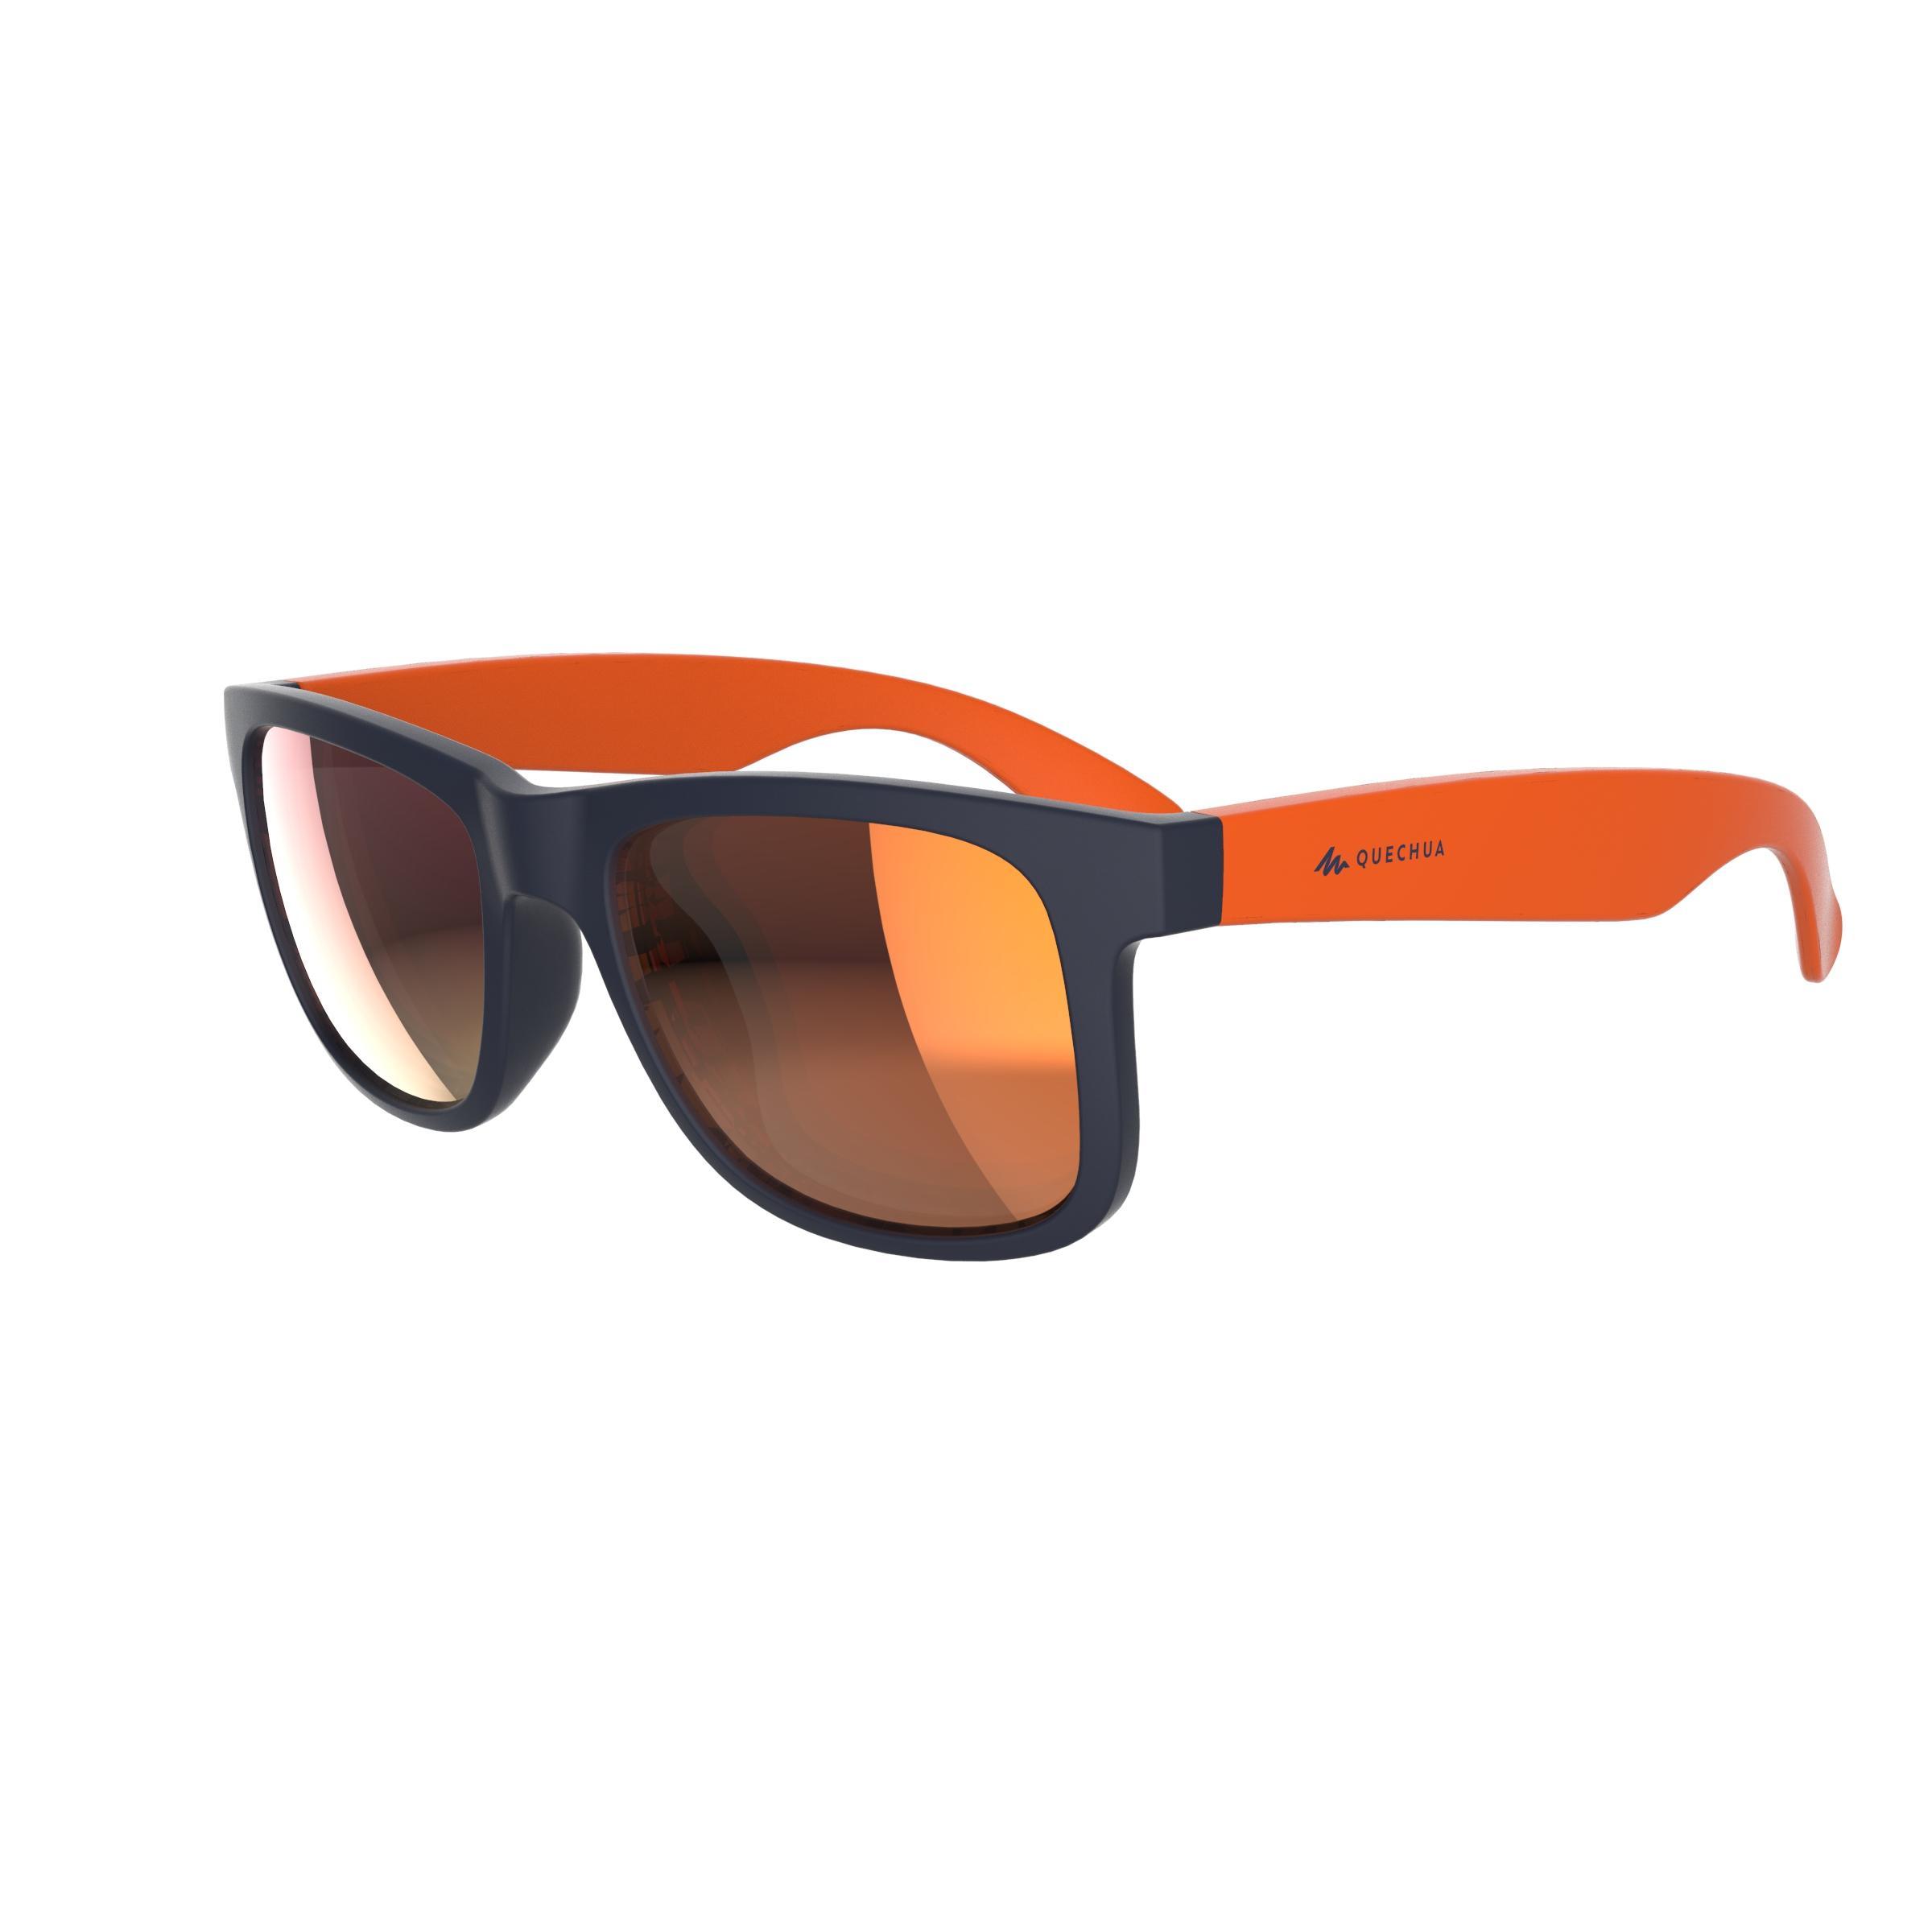 baf725a454e54c Ski zonnebril kopen ← Decathlon.nl